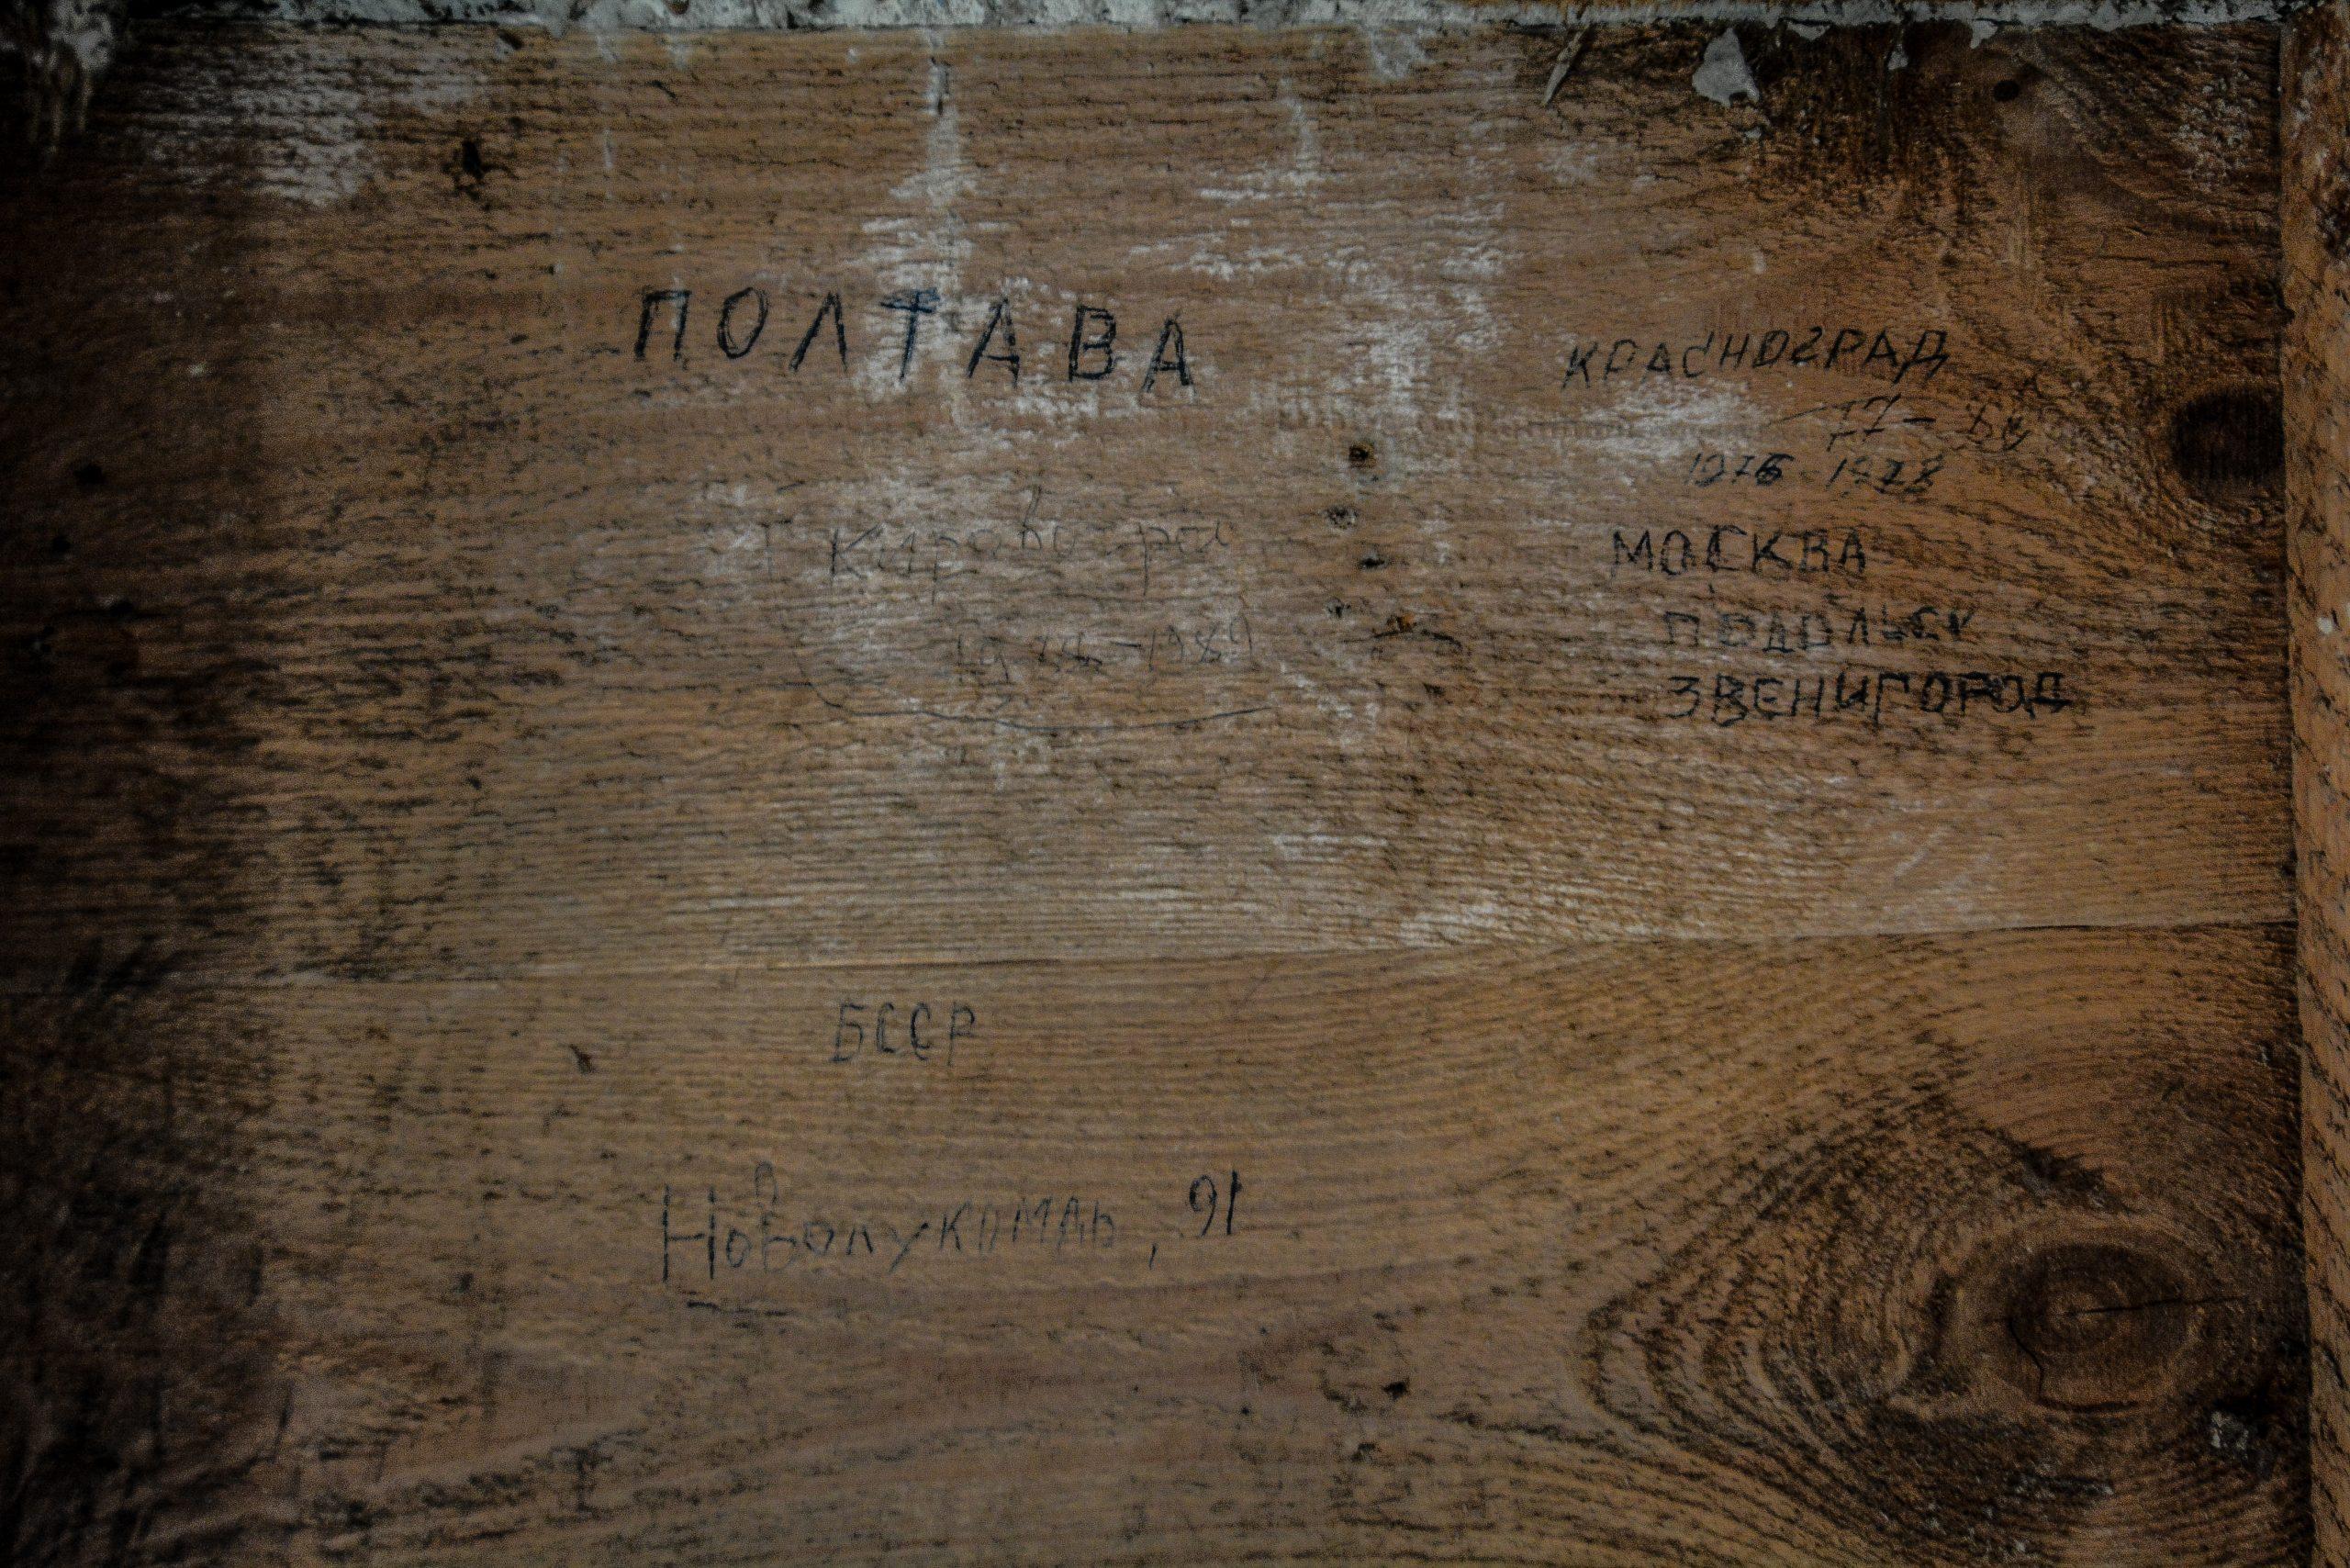 soviet name inscriptions red army theather forst zinna adolf hitler lager luckenwalde juterbog sowjet kaserne soviet military barracks germany lost places urbex abandoned